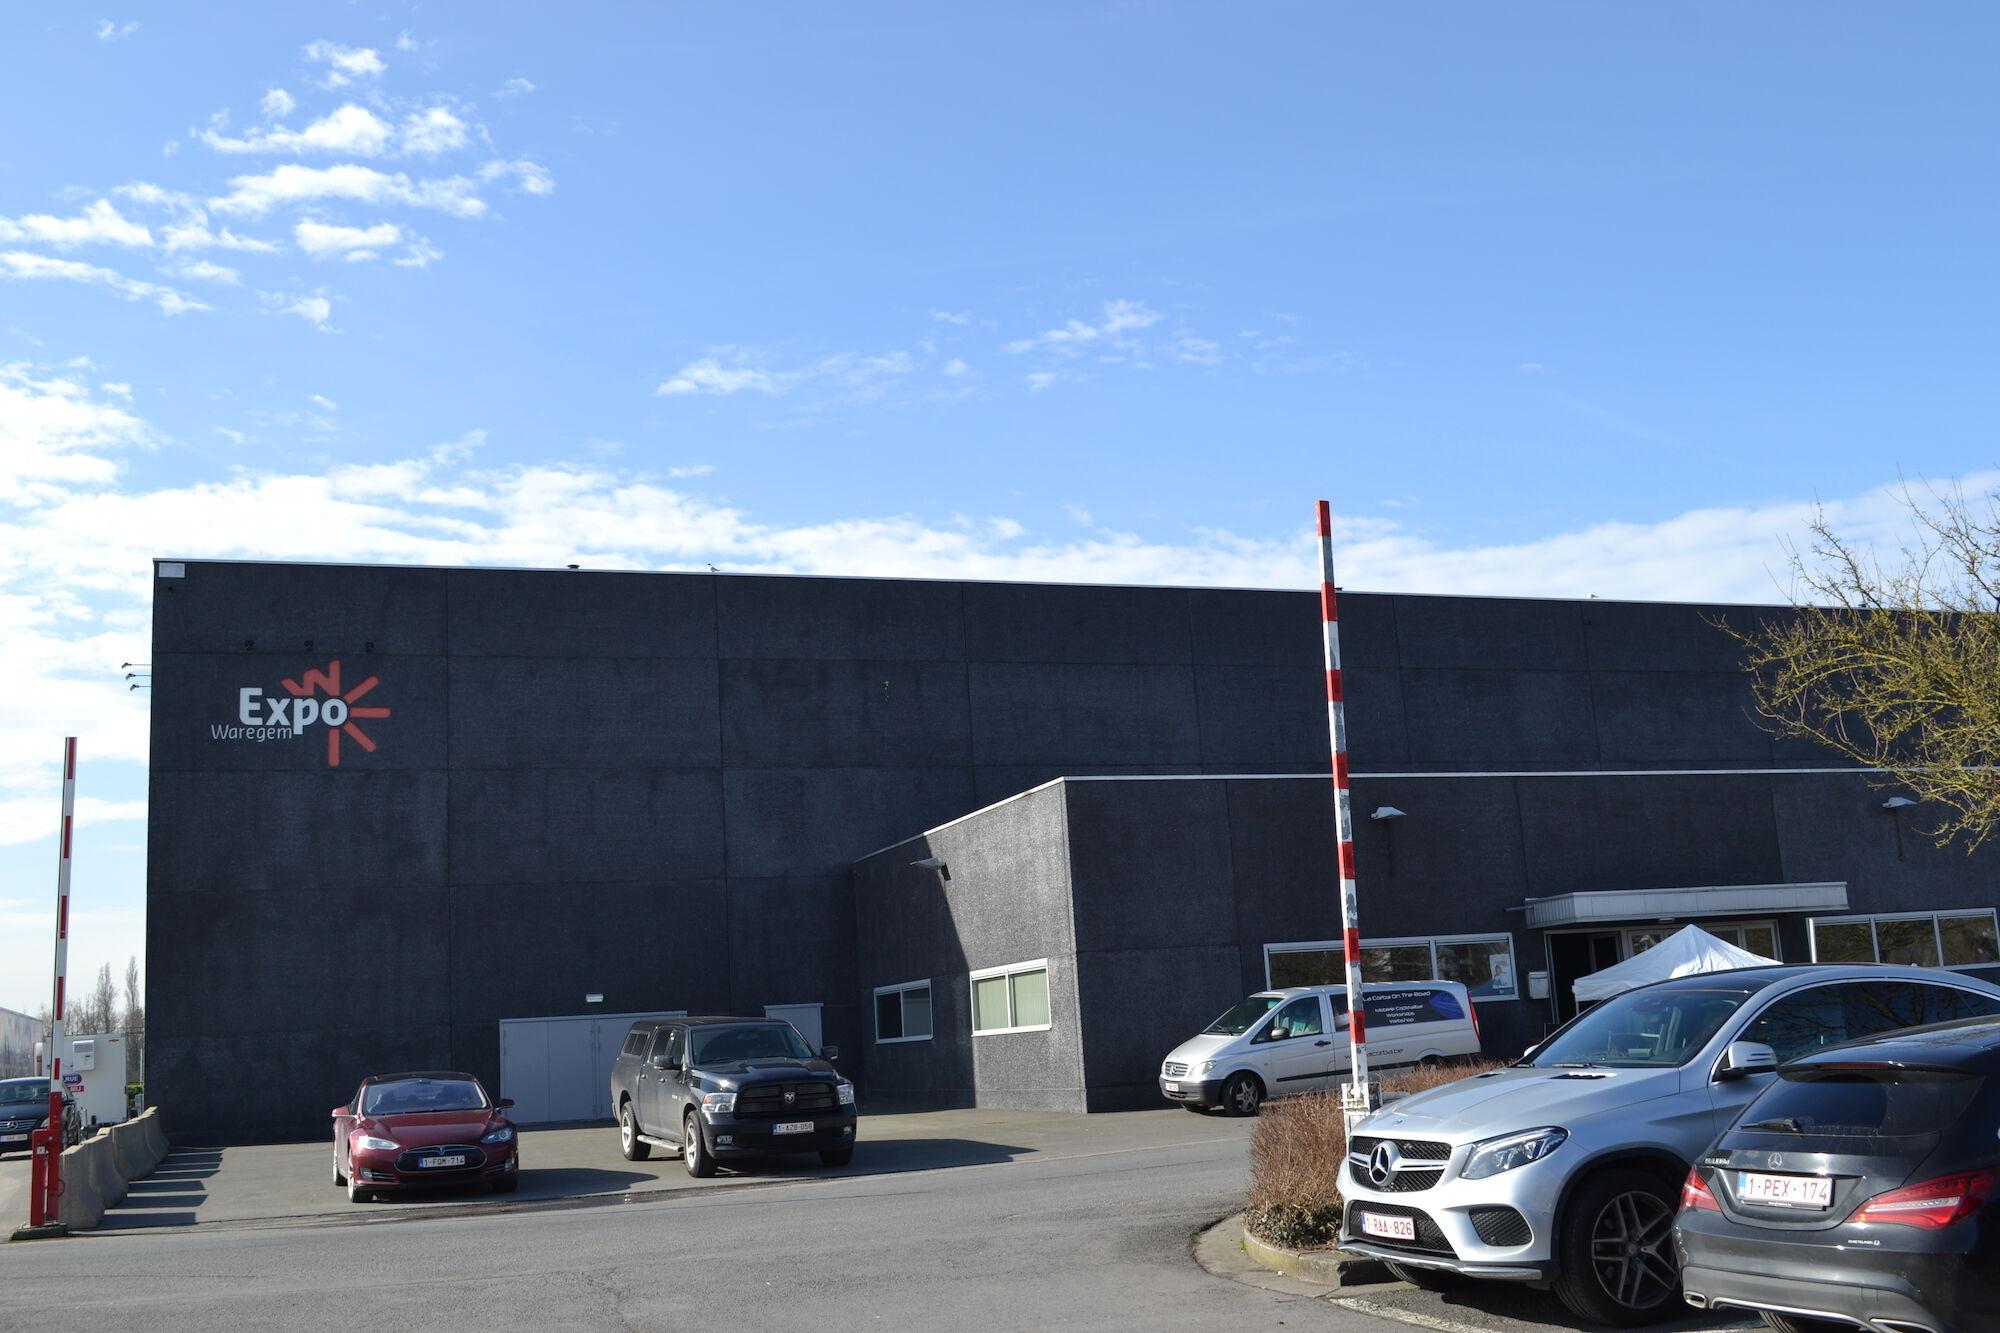 Waregem Expo